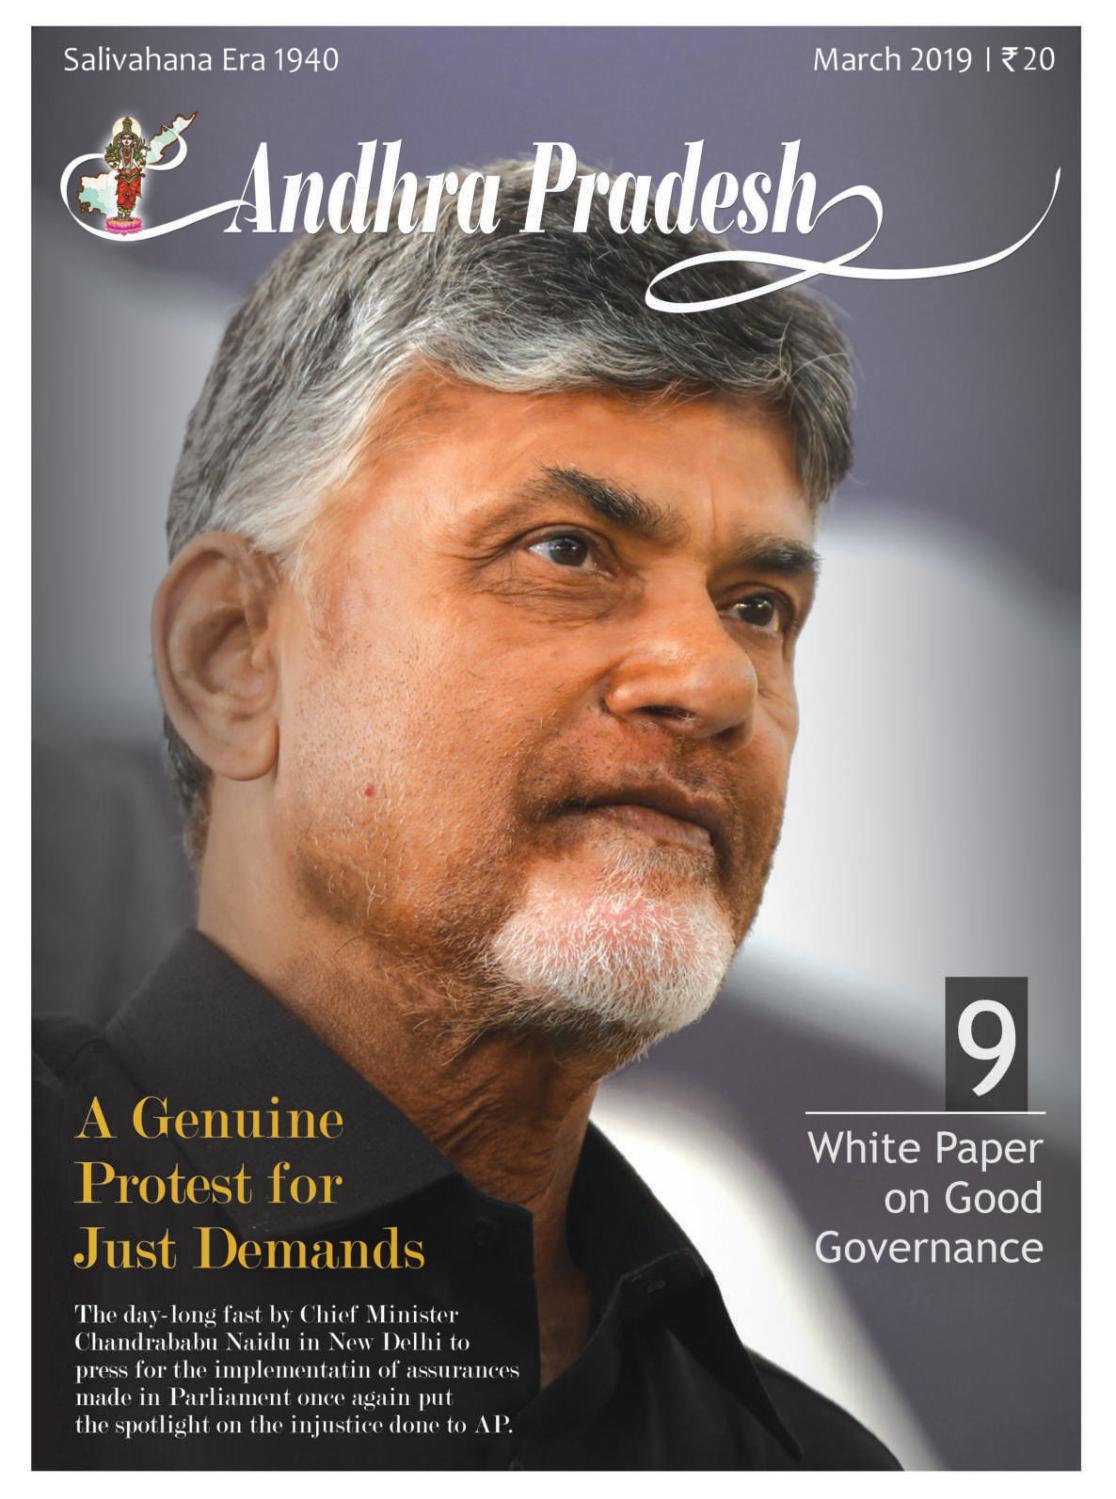 Andhra Pradesh English March 2019 by Andhra Pradesh Magazine